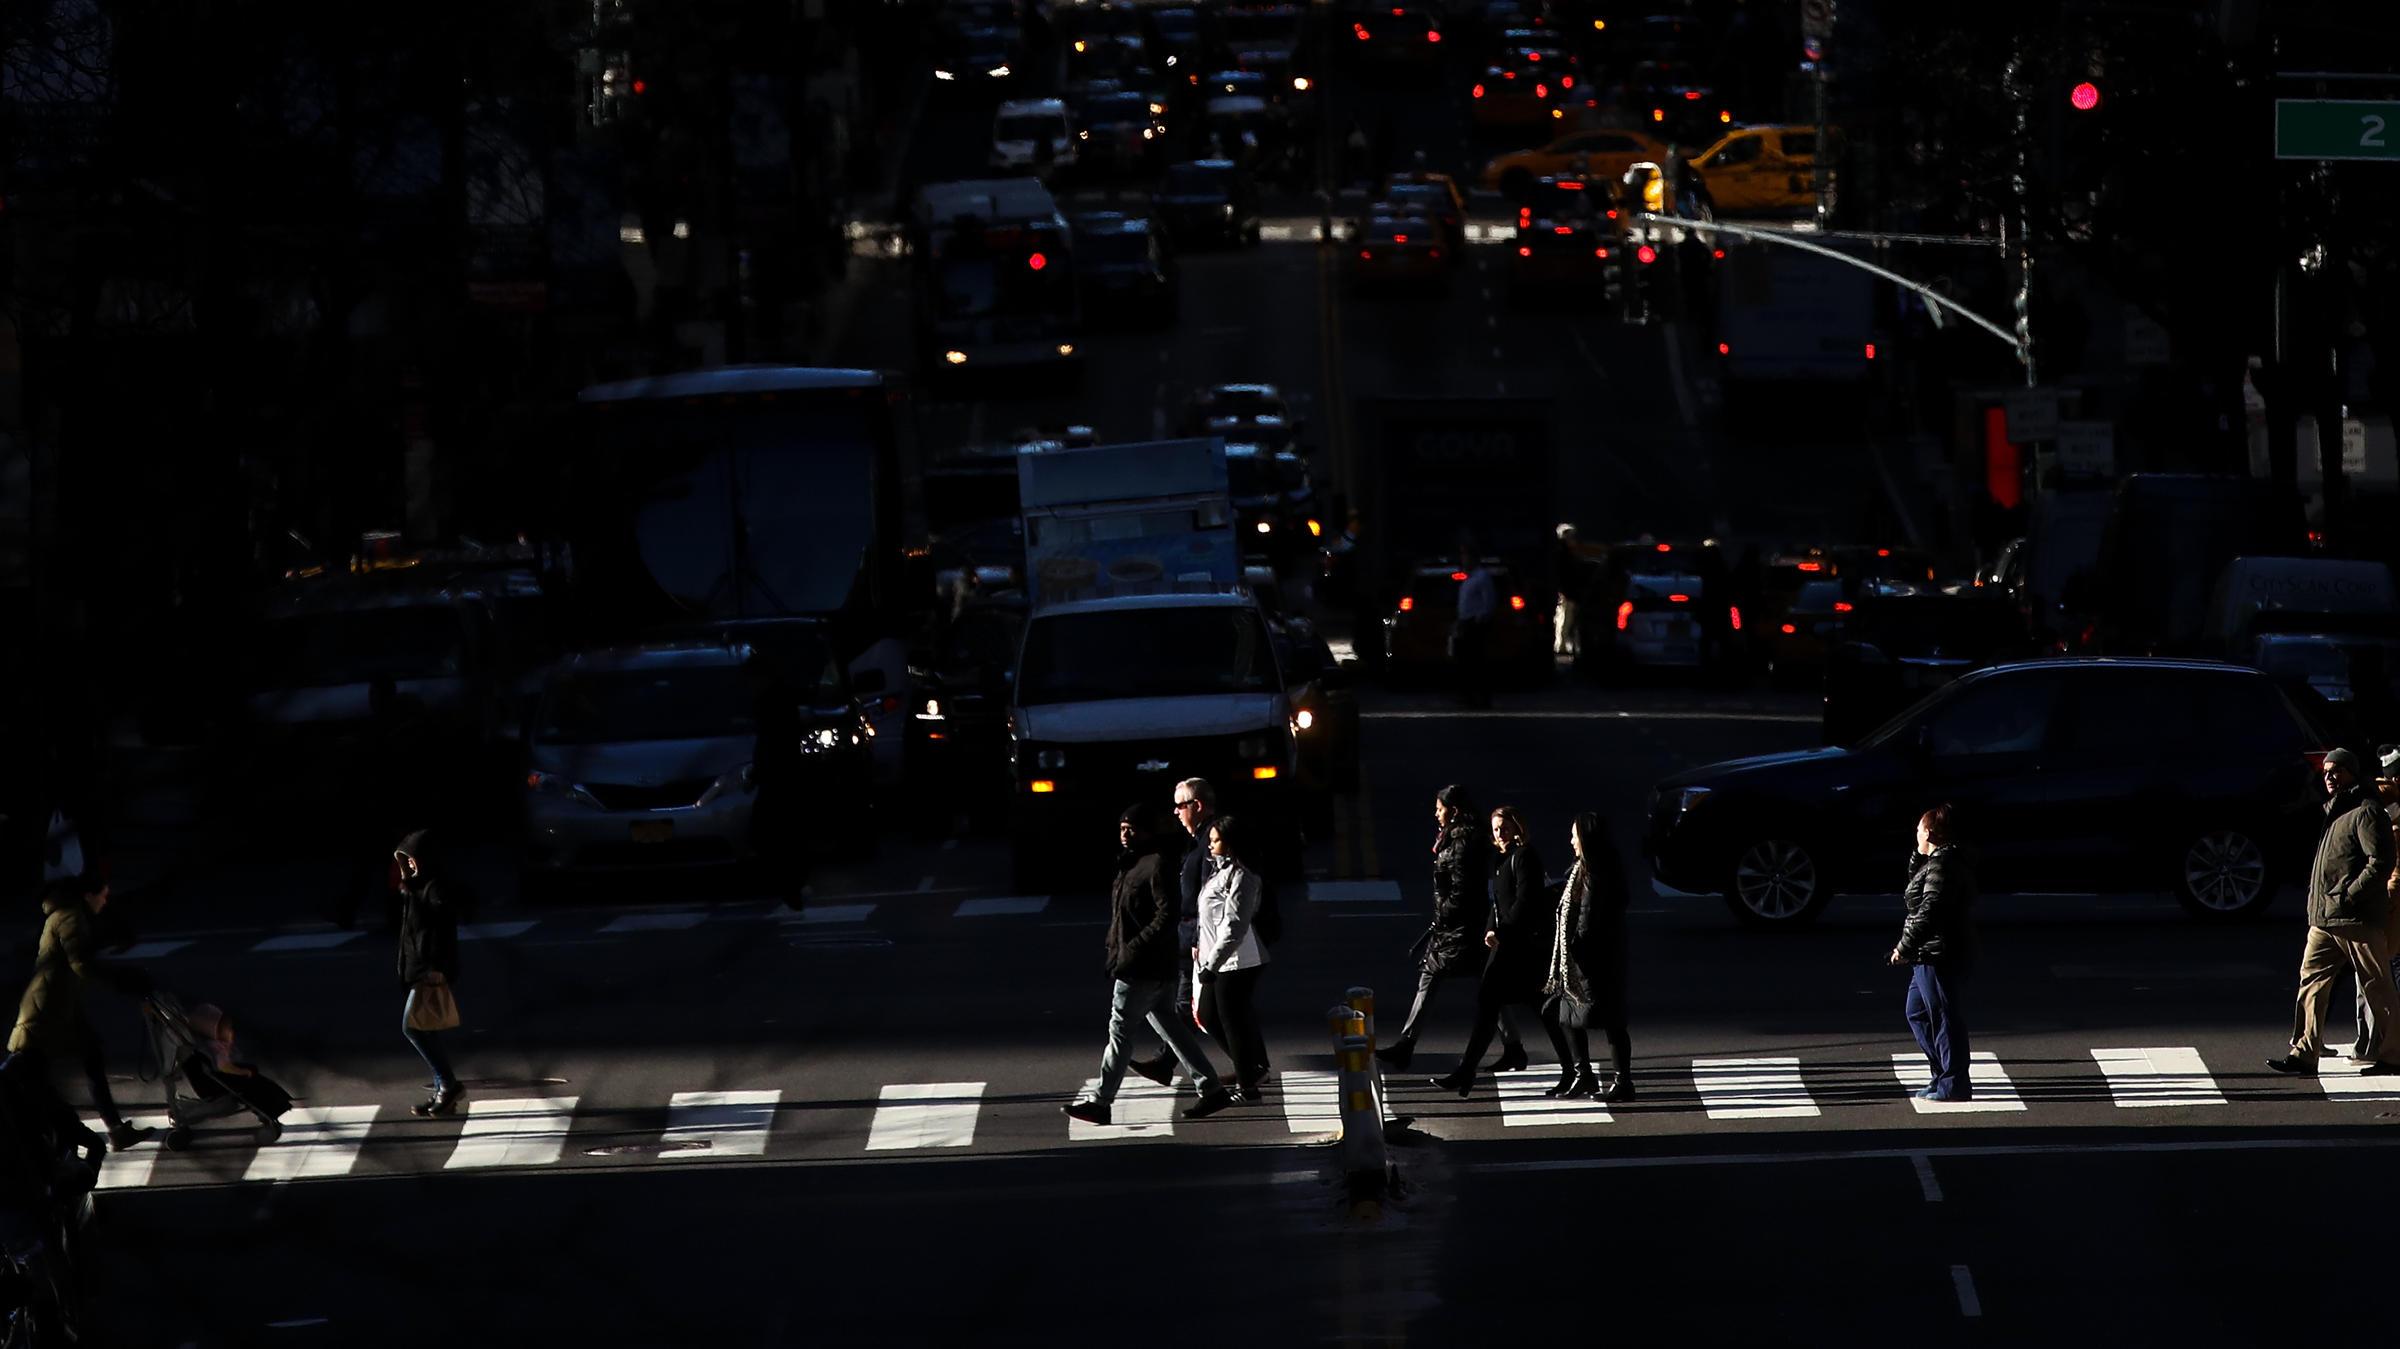 Preliminary data shows pedestrian traffic deaths increasing in Washington